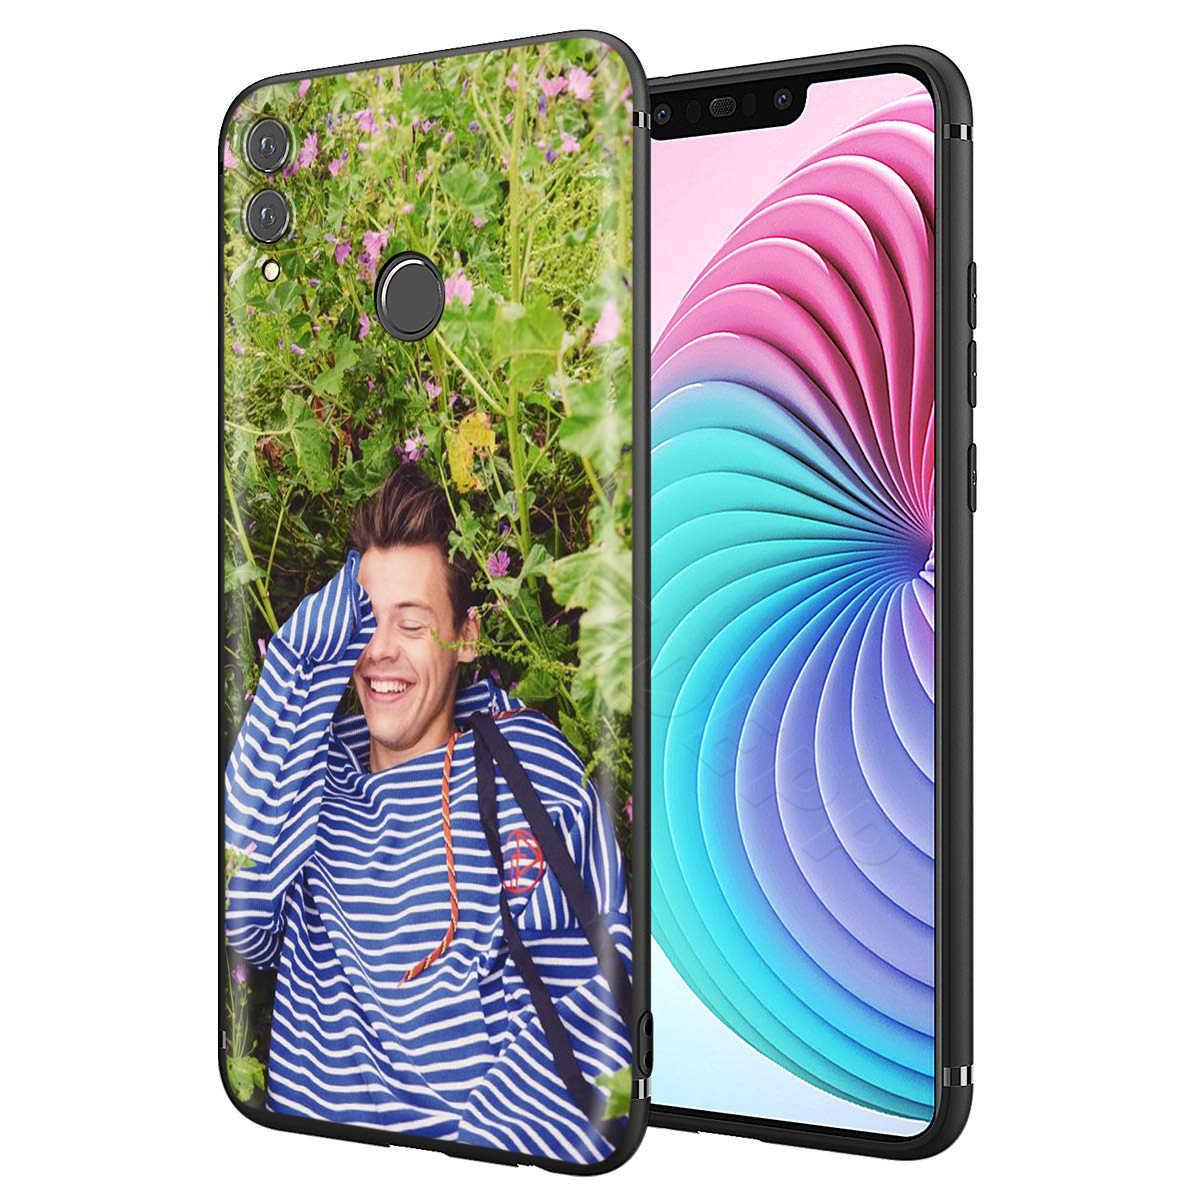 Webbedepp ハリースタイルかわいいケース Huawei 社の名誉 6A 7A 7C 7 × 8 8X 8C 9 9 × 10 20 Lite プロノート表示